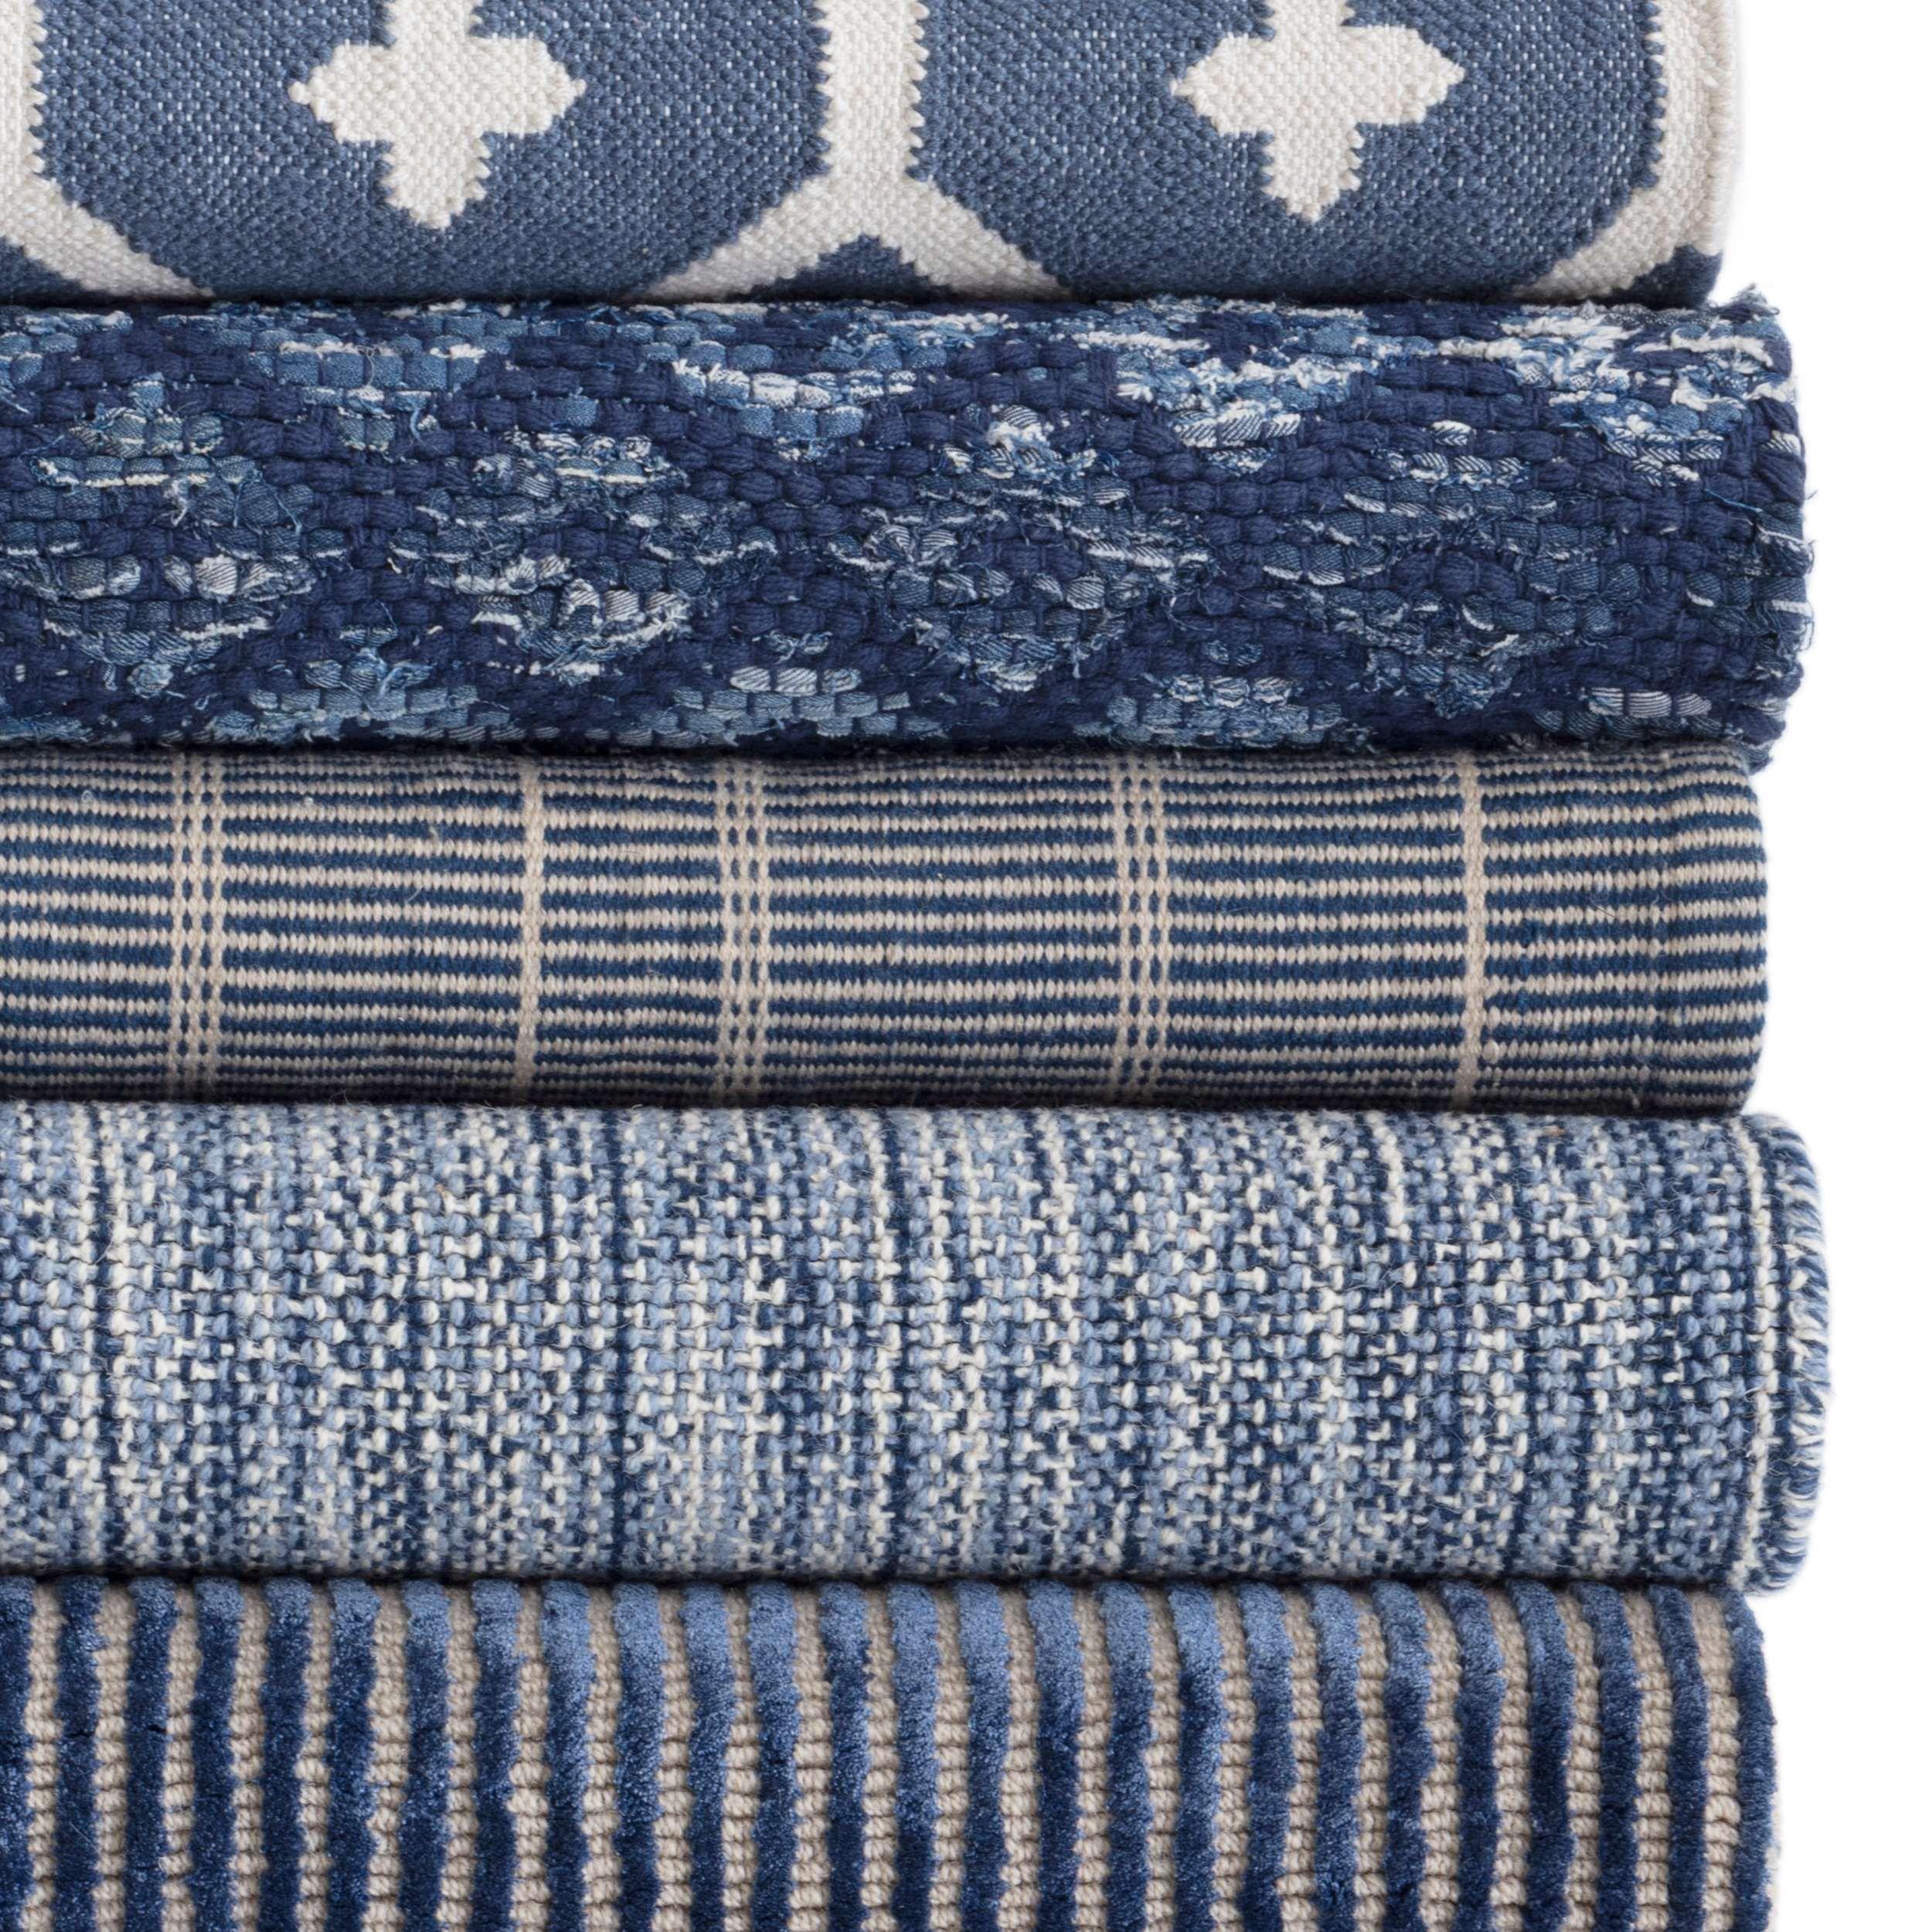 Denim Rag Diamond Indigo Woven Cotton Rug Dash Albert Cotton Rug Denim Rag Rugs Cotton Weaving